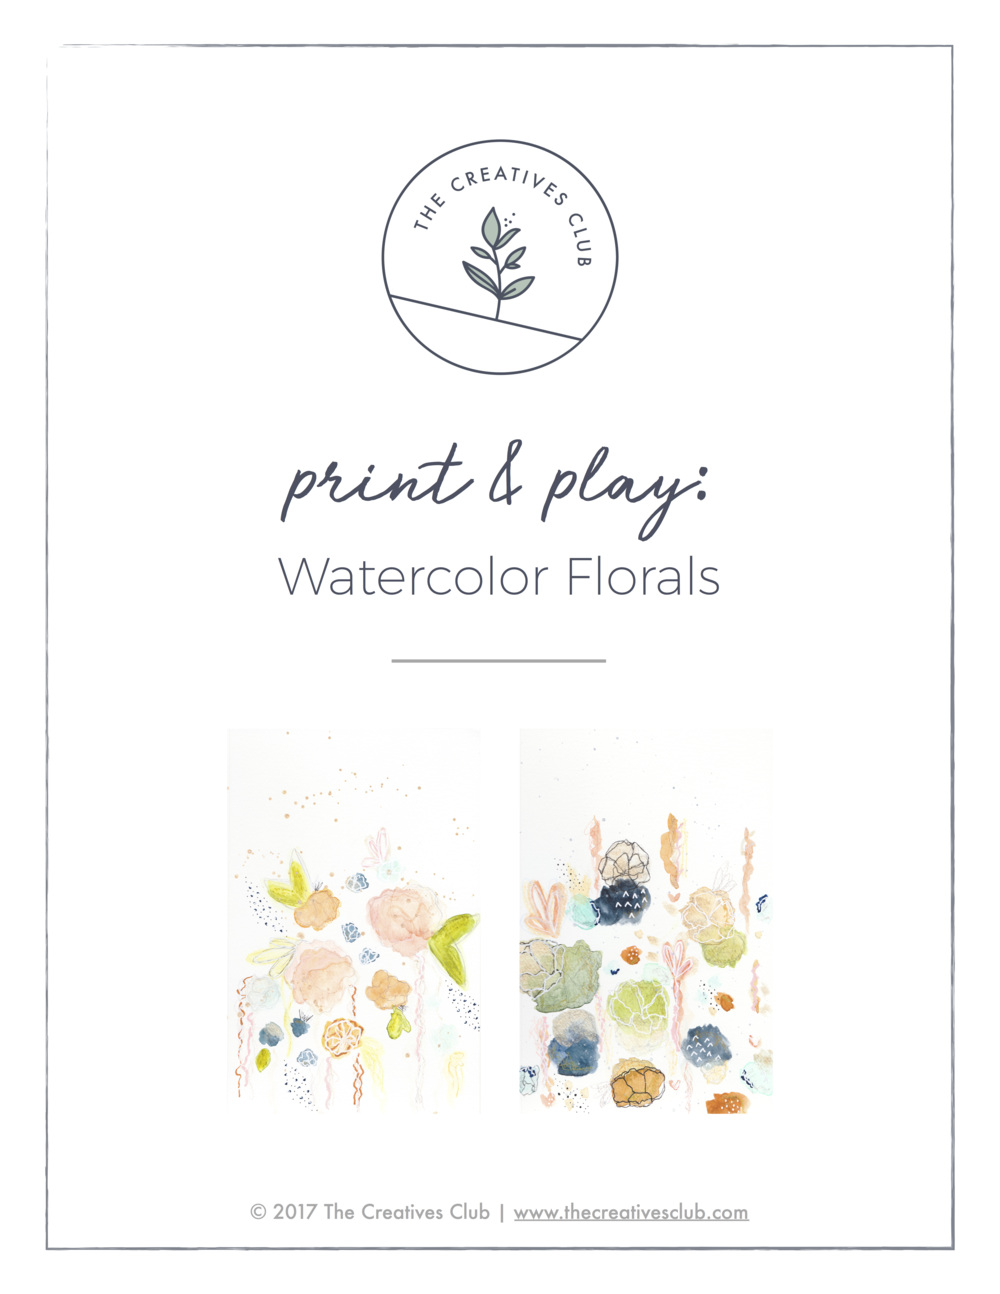 Watercolor Florals Thumbnail.png